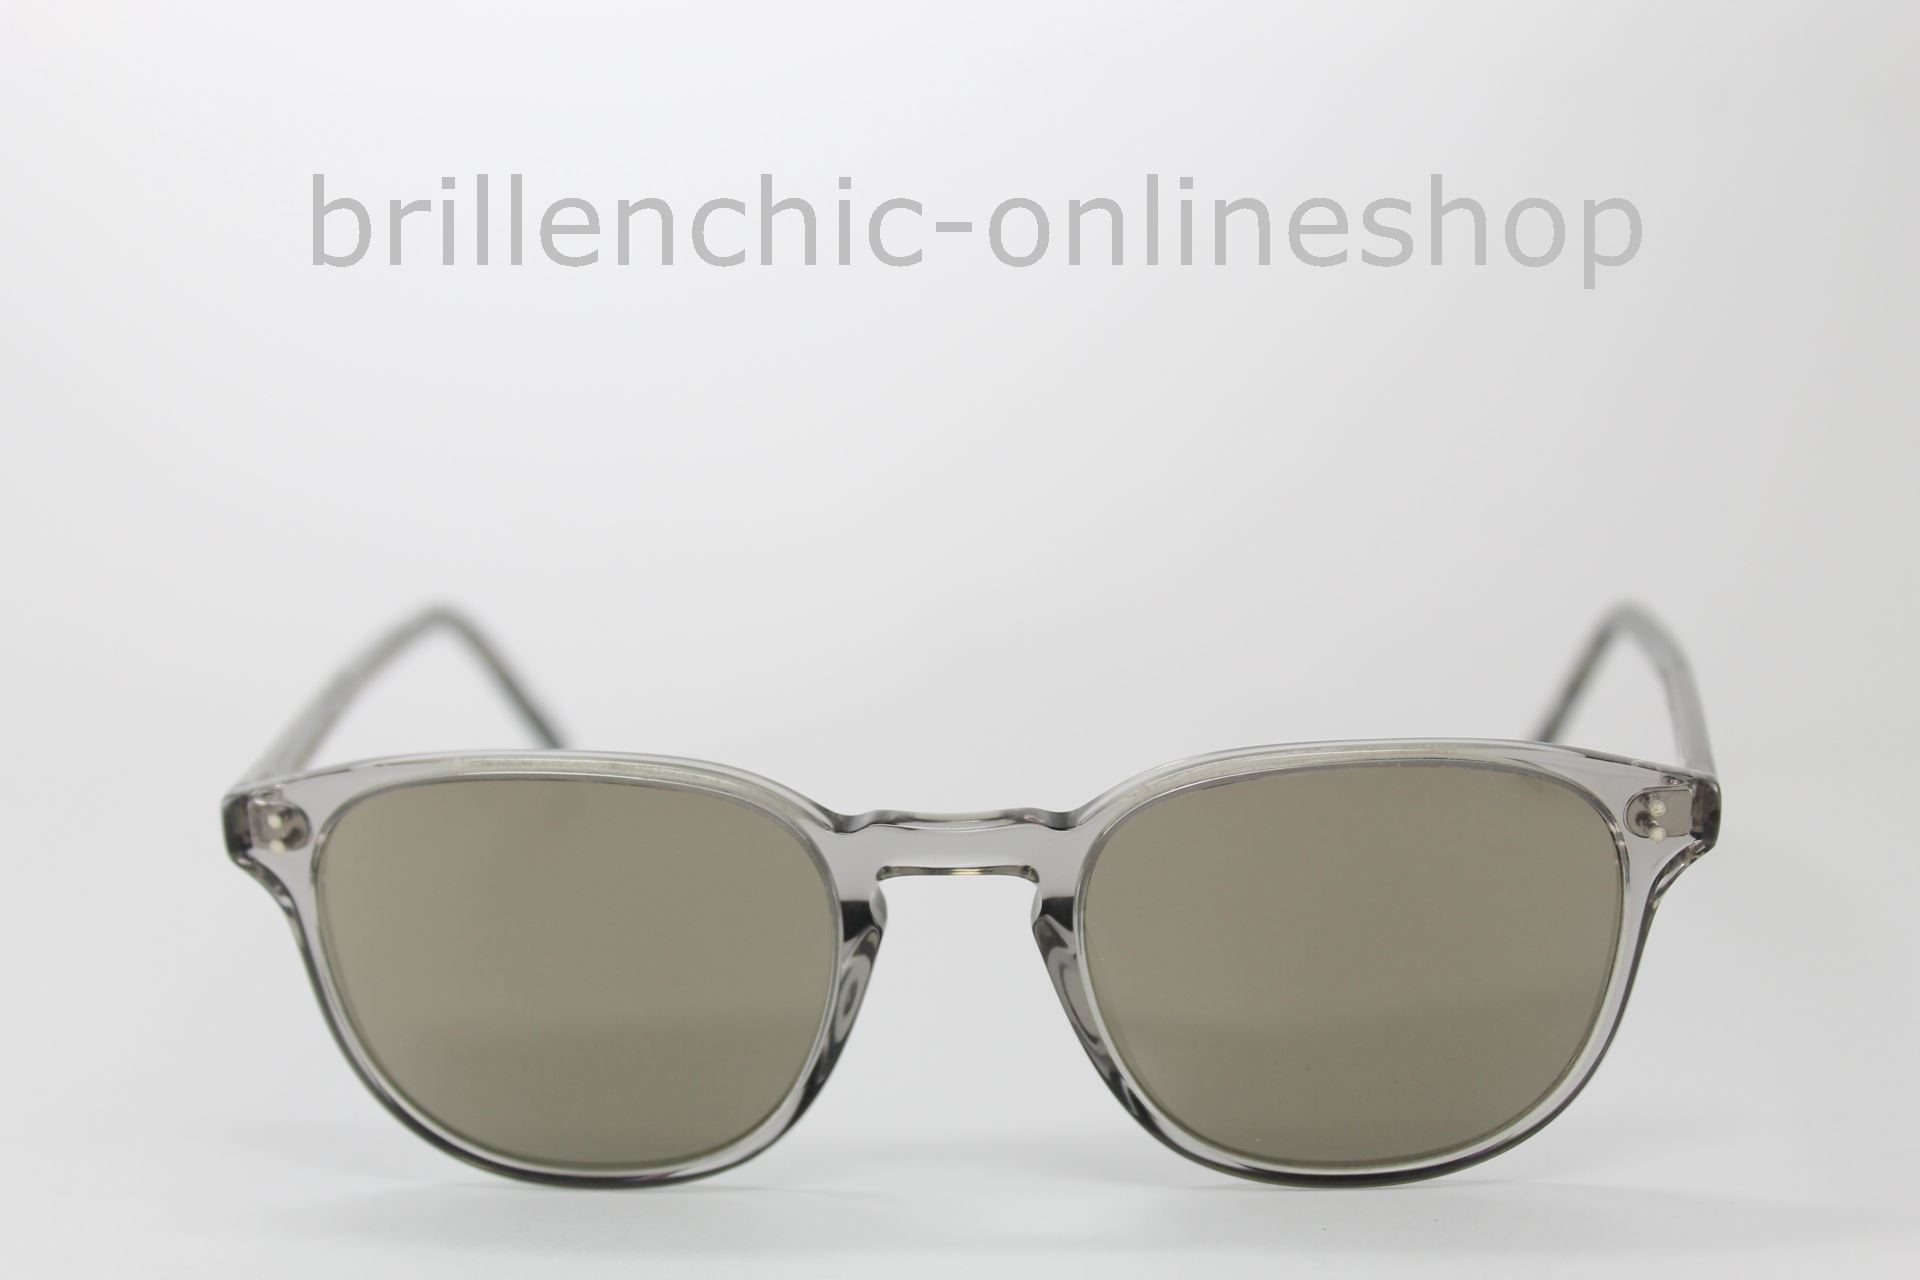 eb4dc1dd254 Brillenchic-onlineshop in Berlin - OLIVER PEOPLES FAIRMONT SUN OV ...